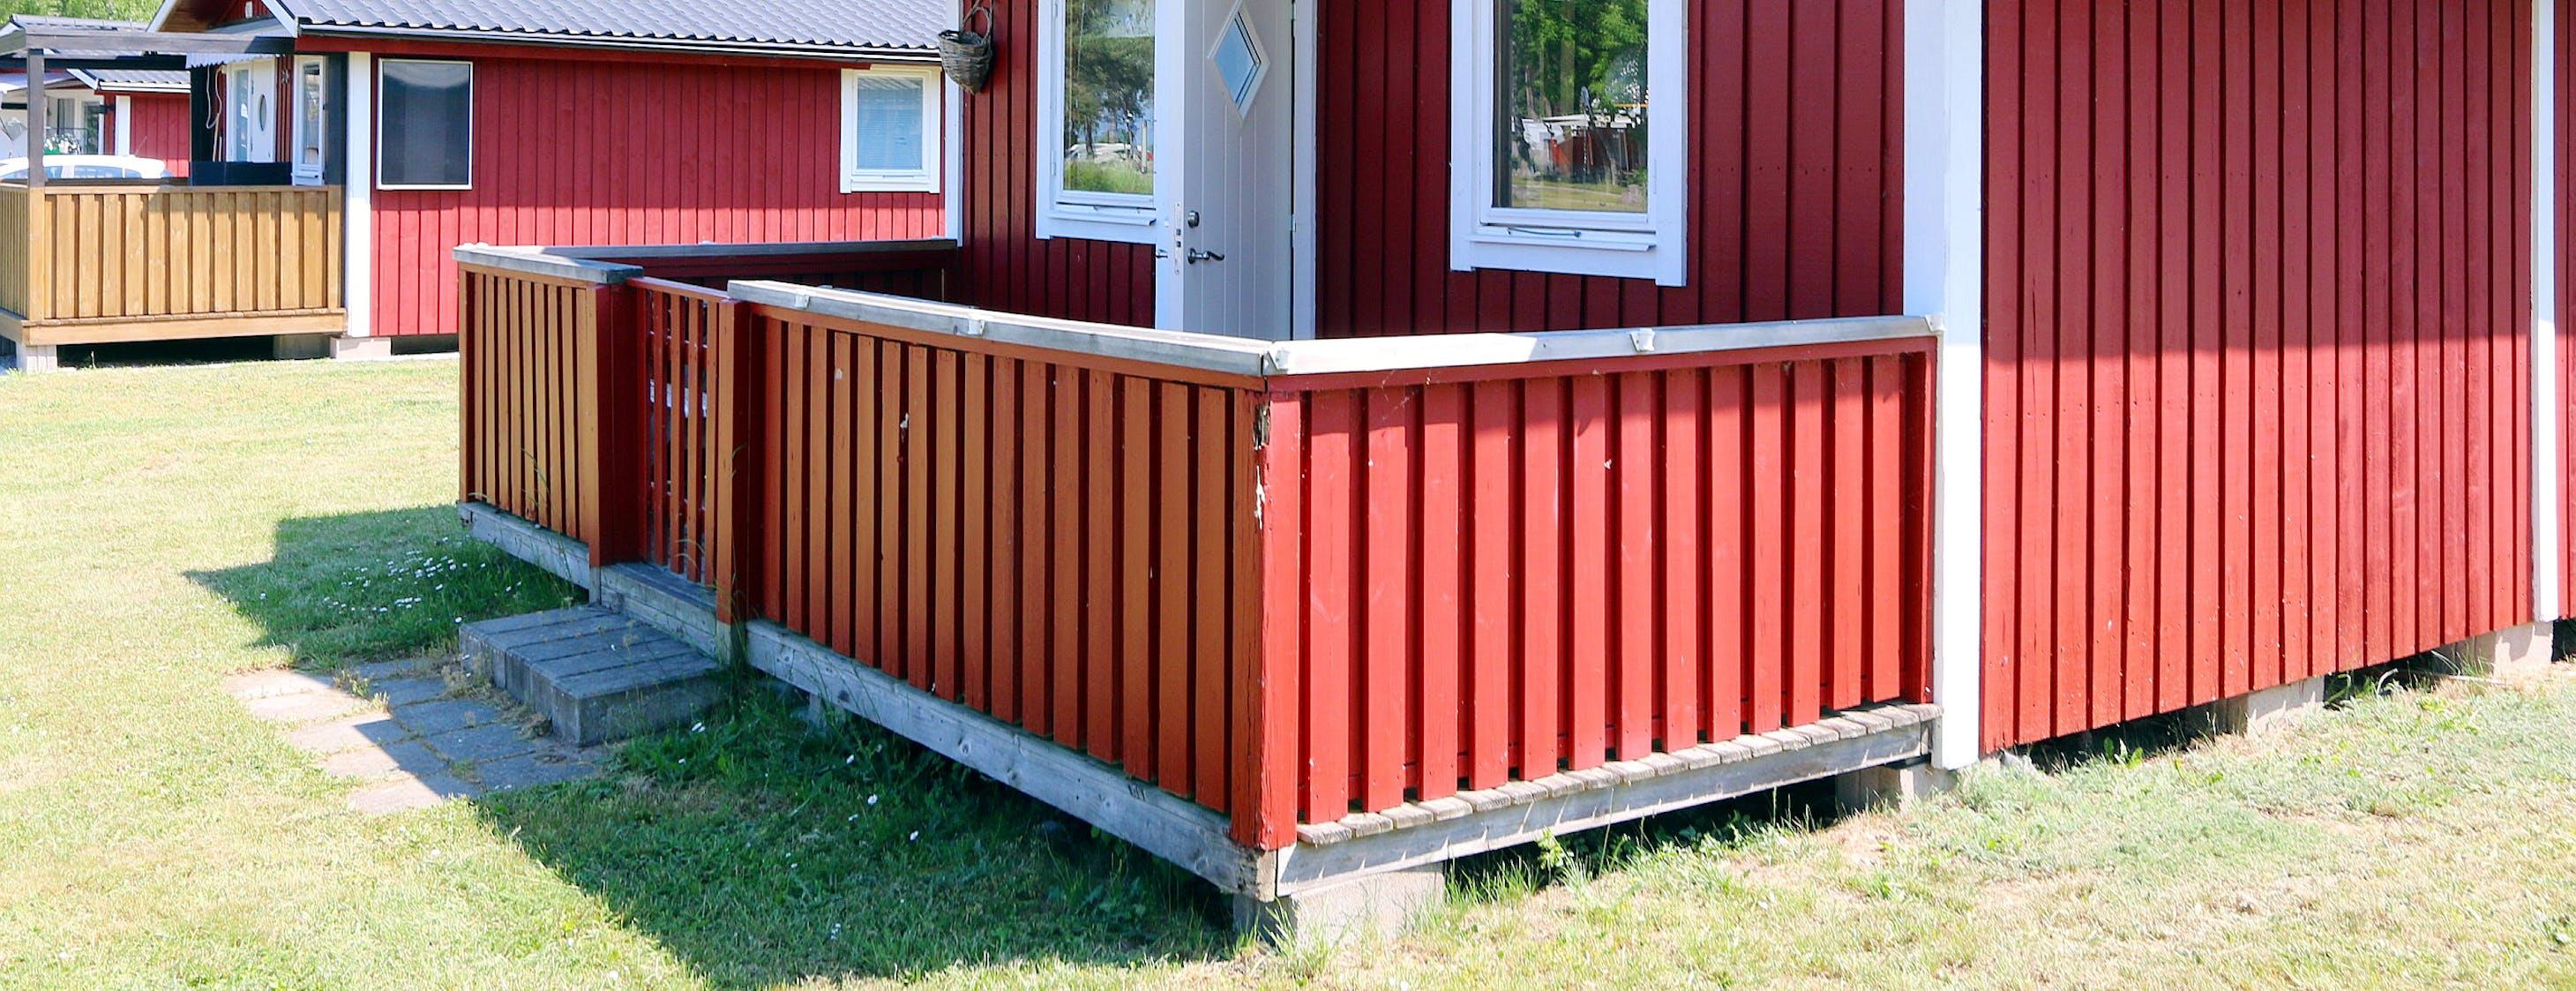 Stuga 32 - Ekerum Camping Ekerum Camping